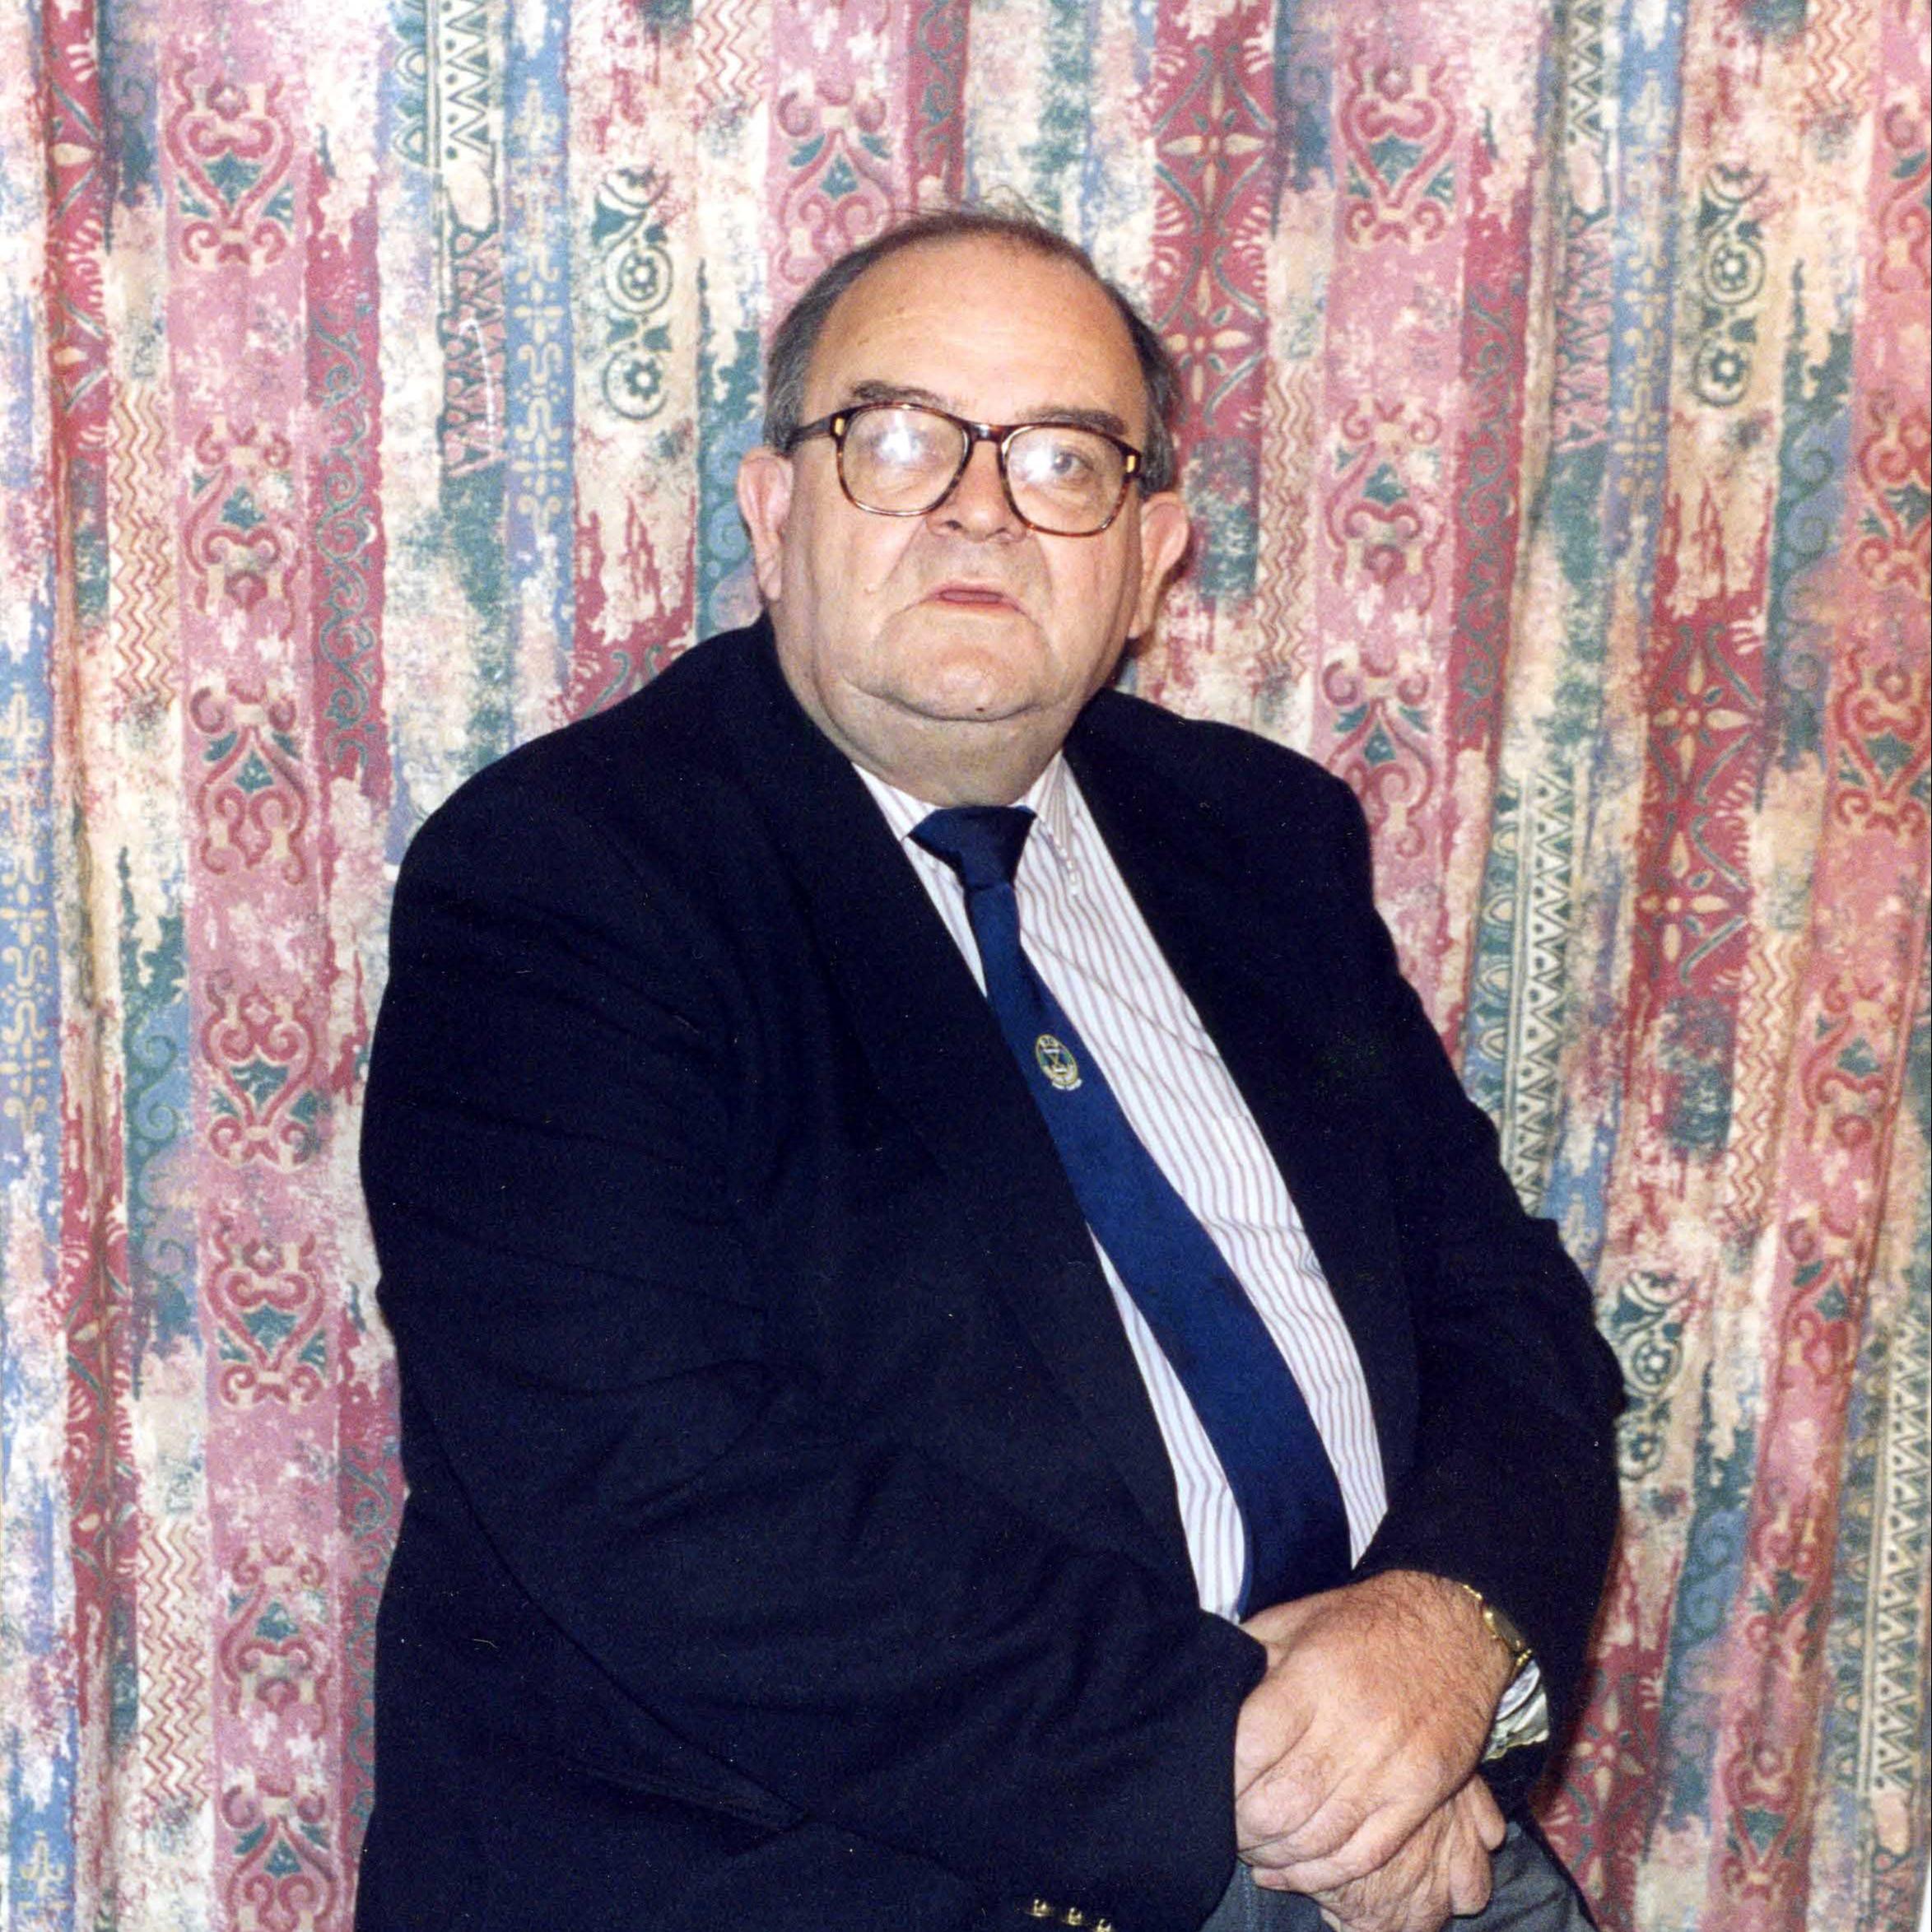 T Greig - 1993-1995